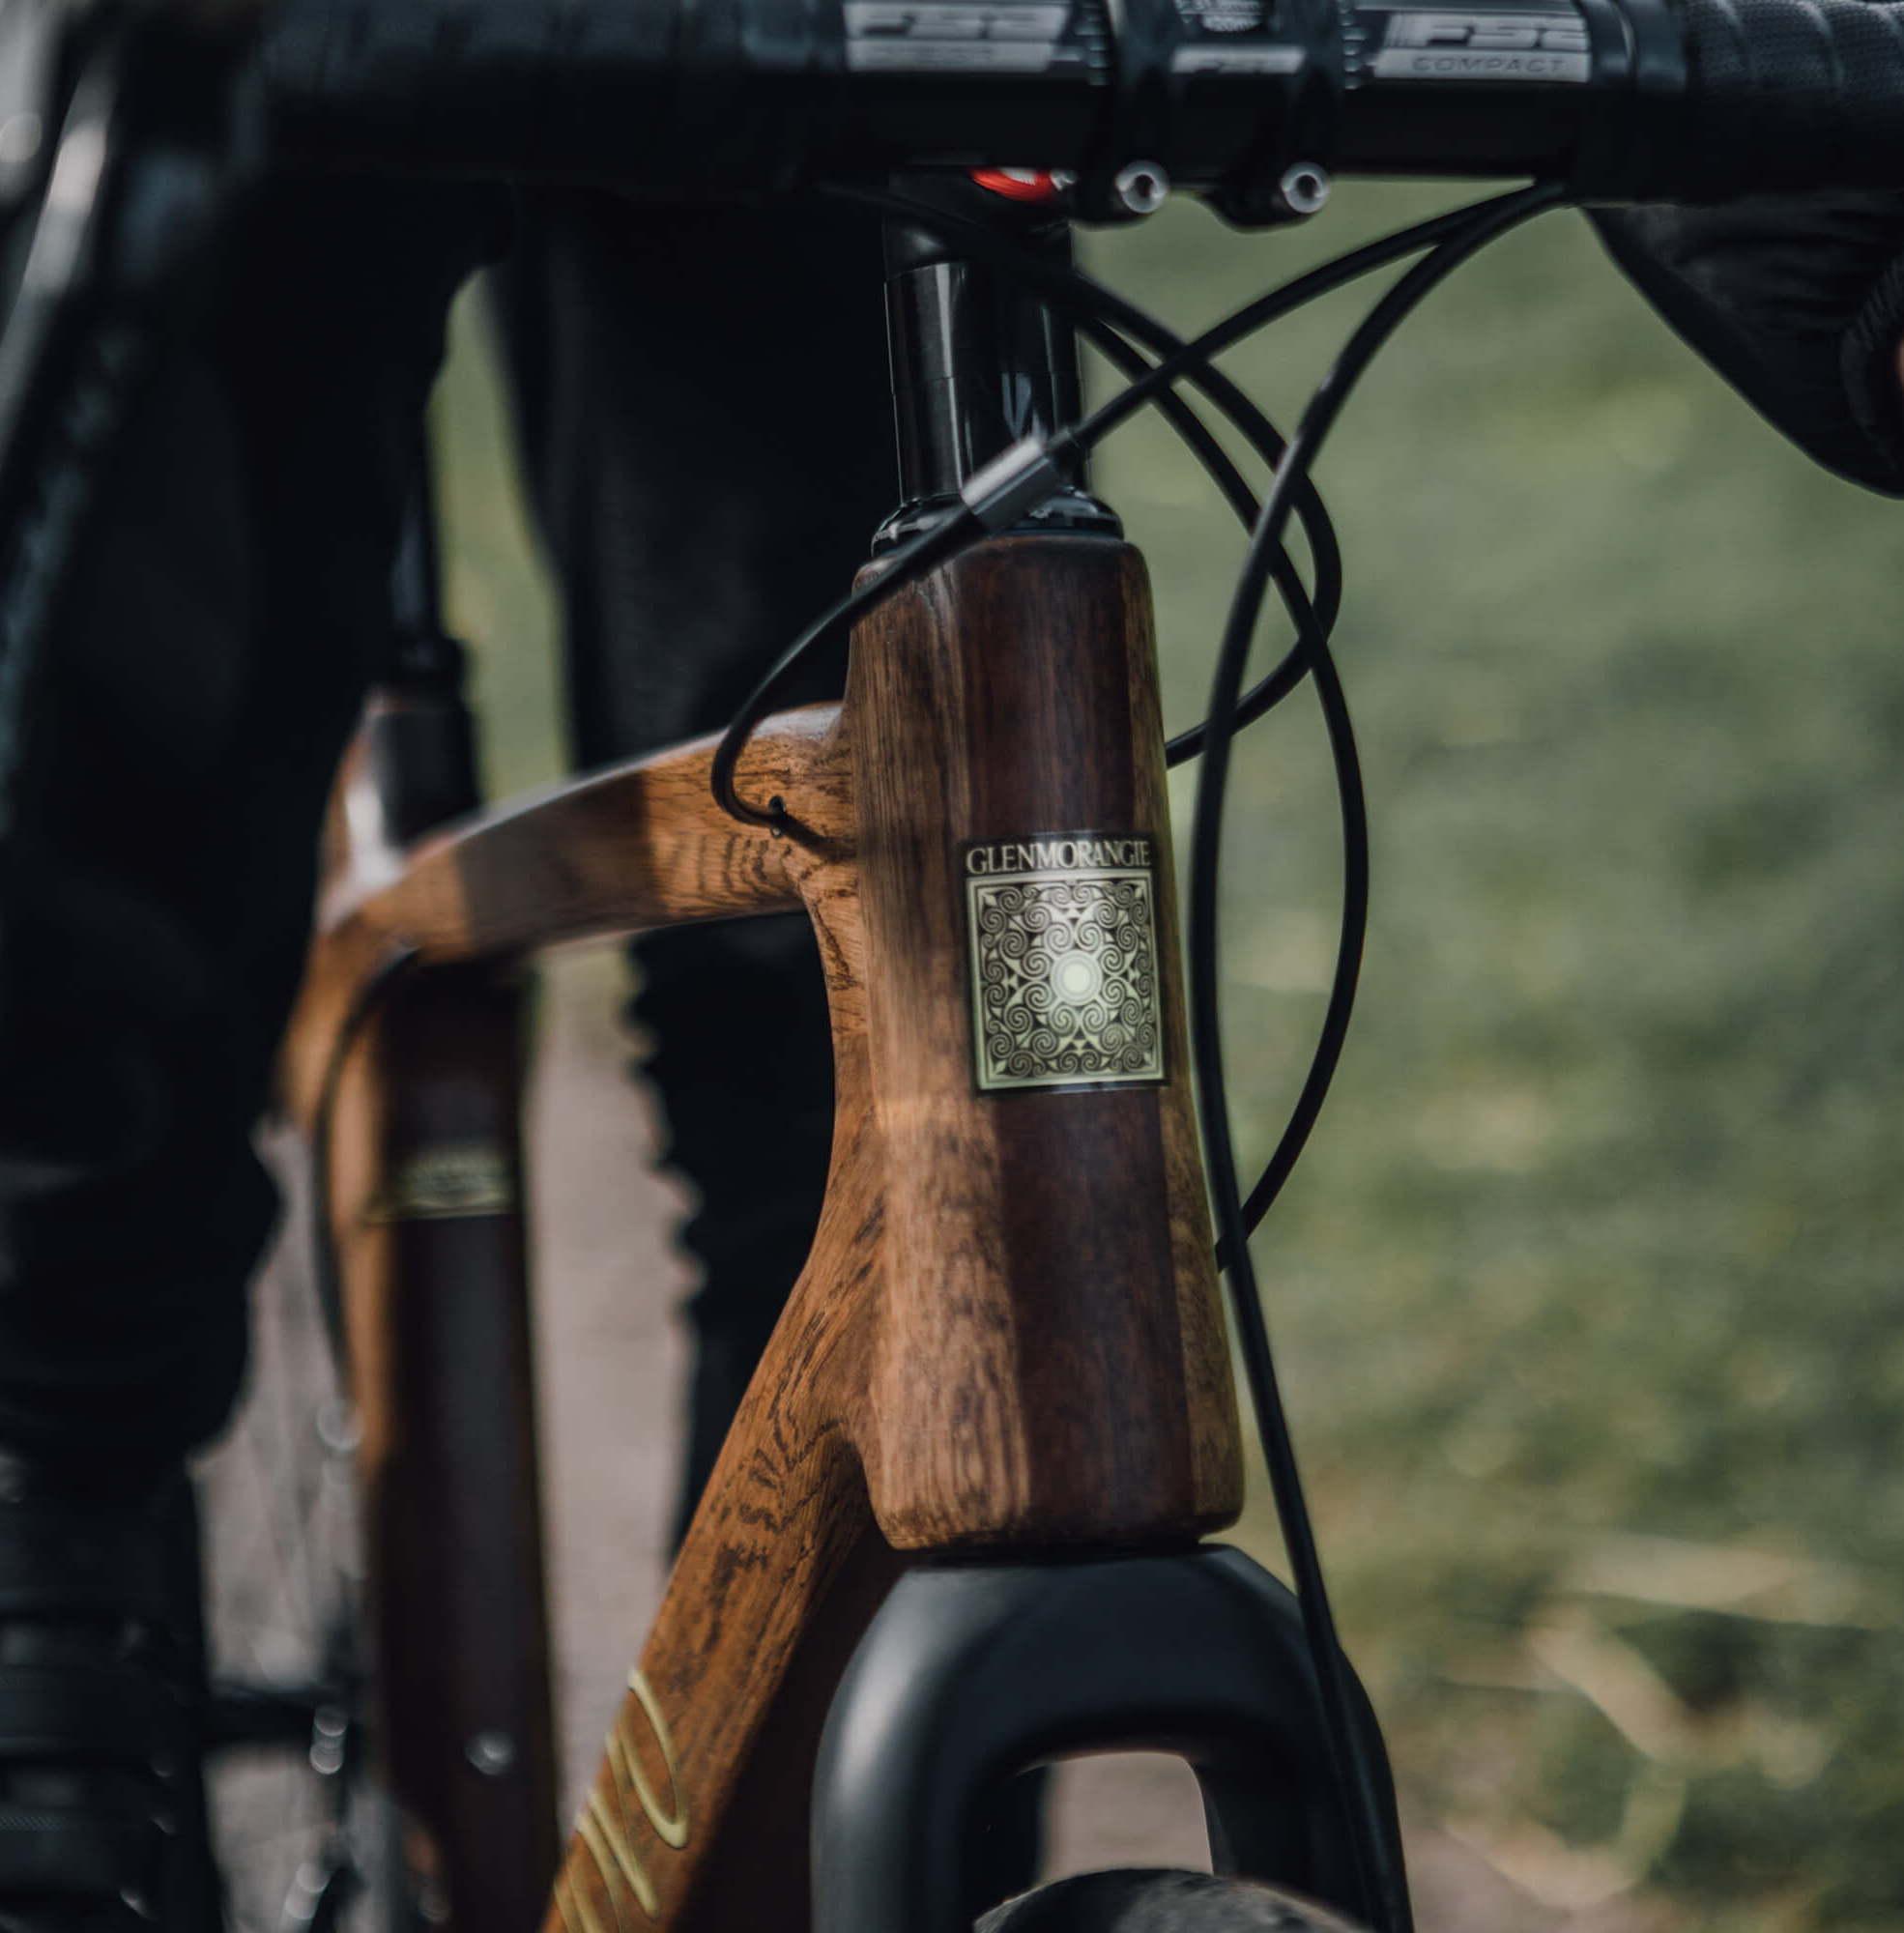 renovo x glenmorangie original bicycle renovo hardwood bicycles